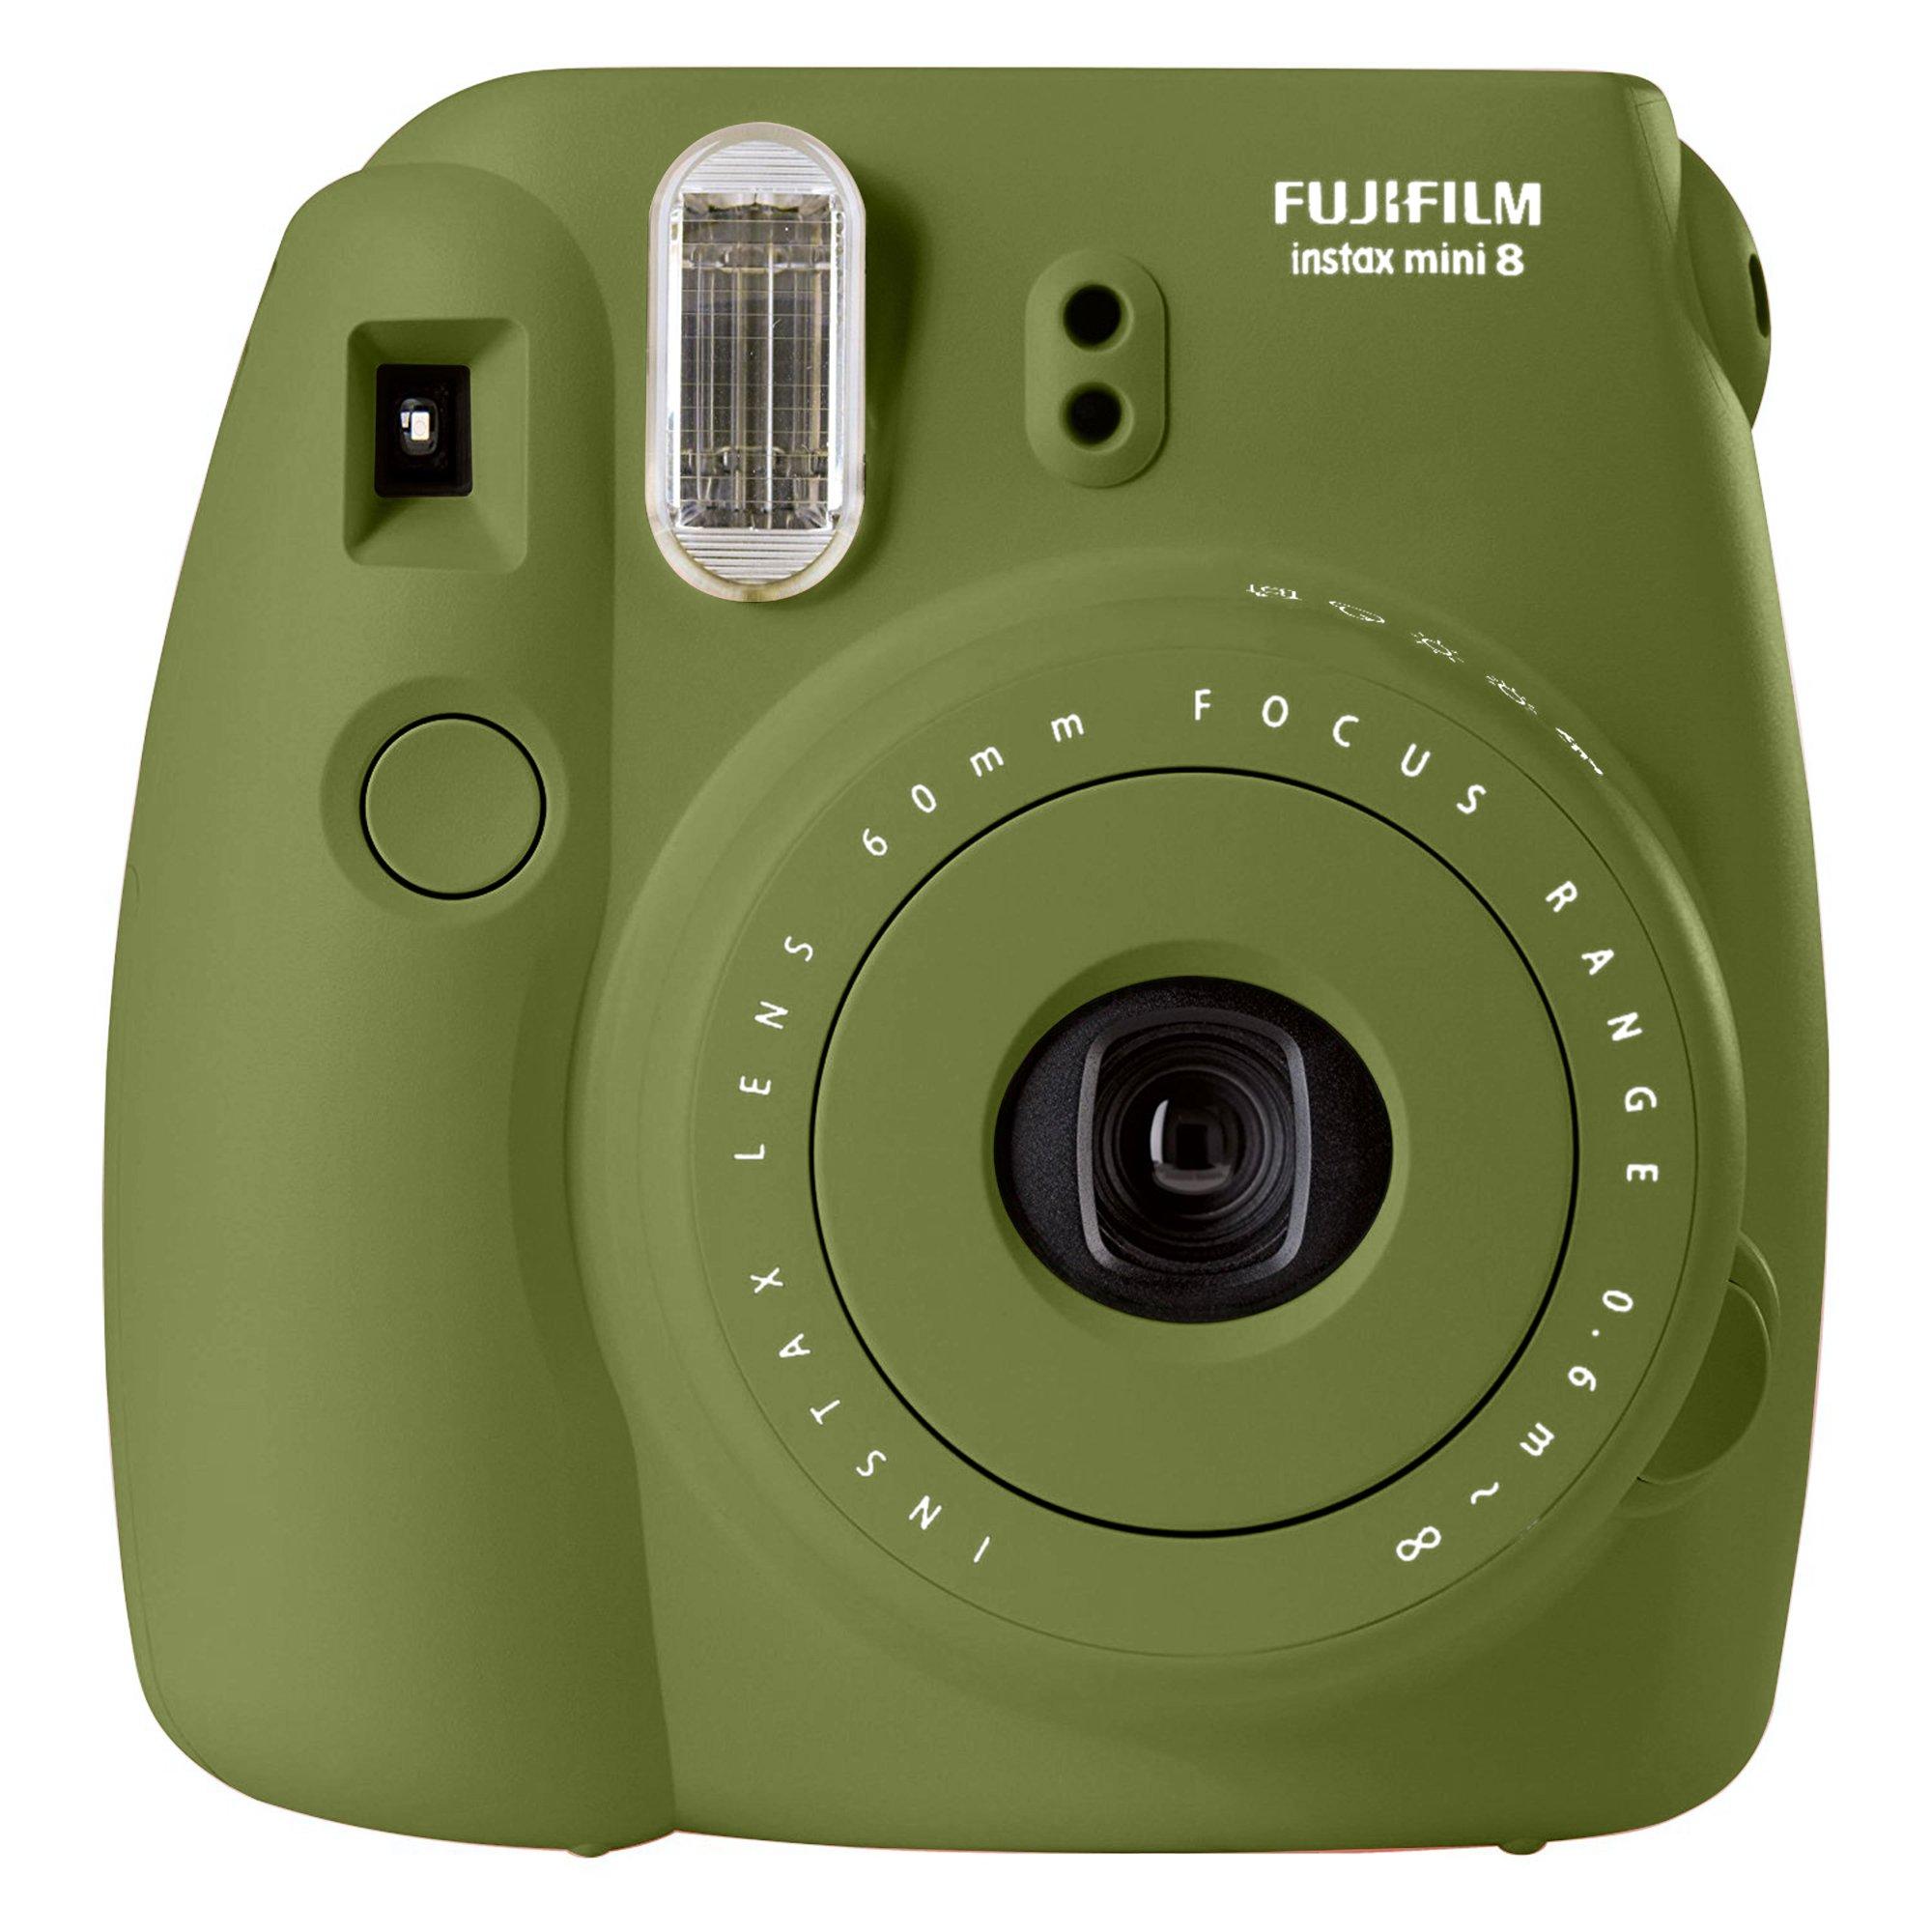 Fujifilm instax mini 8 Instant Film Camera (AVOCADO) - International No Warranty